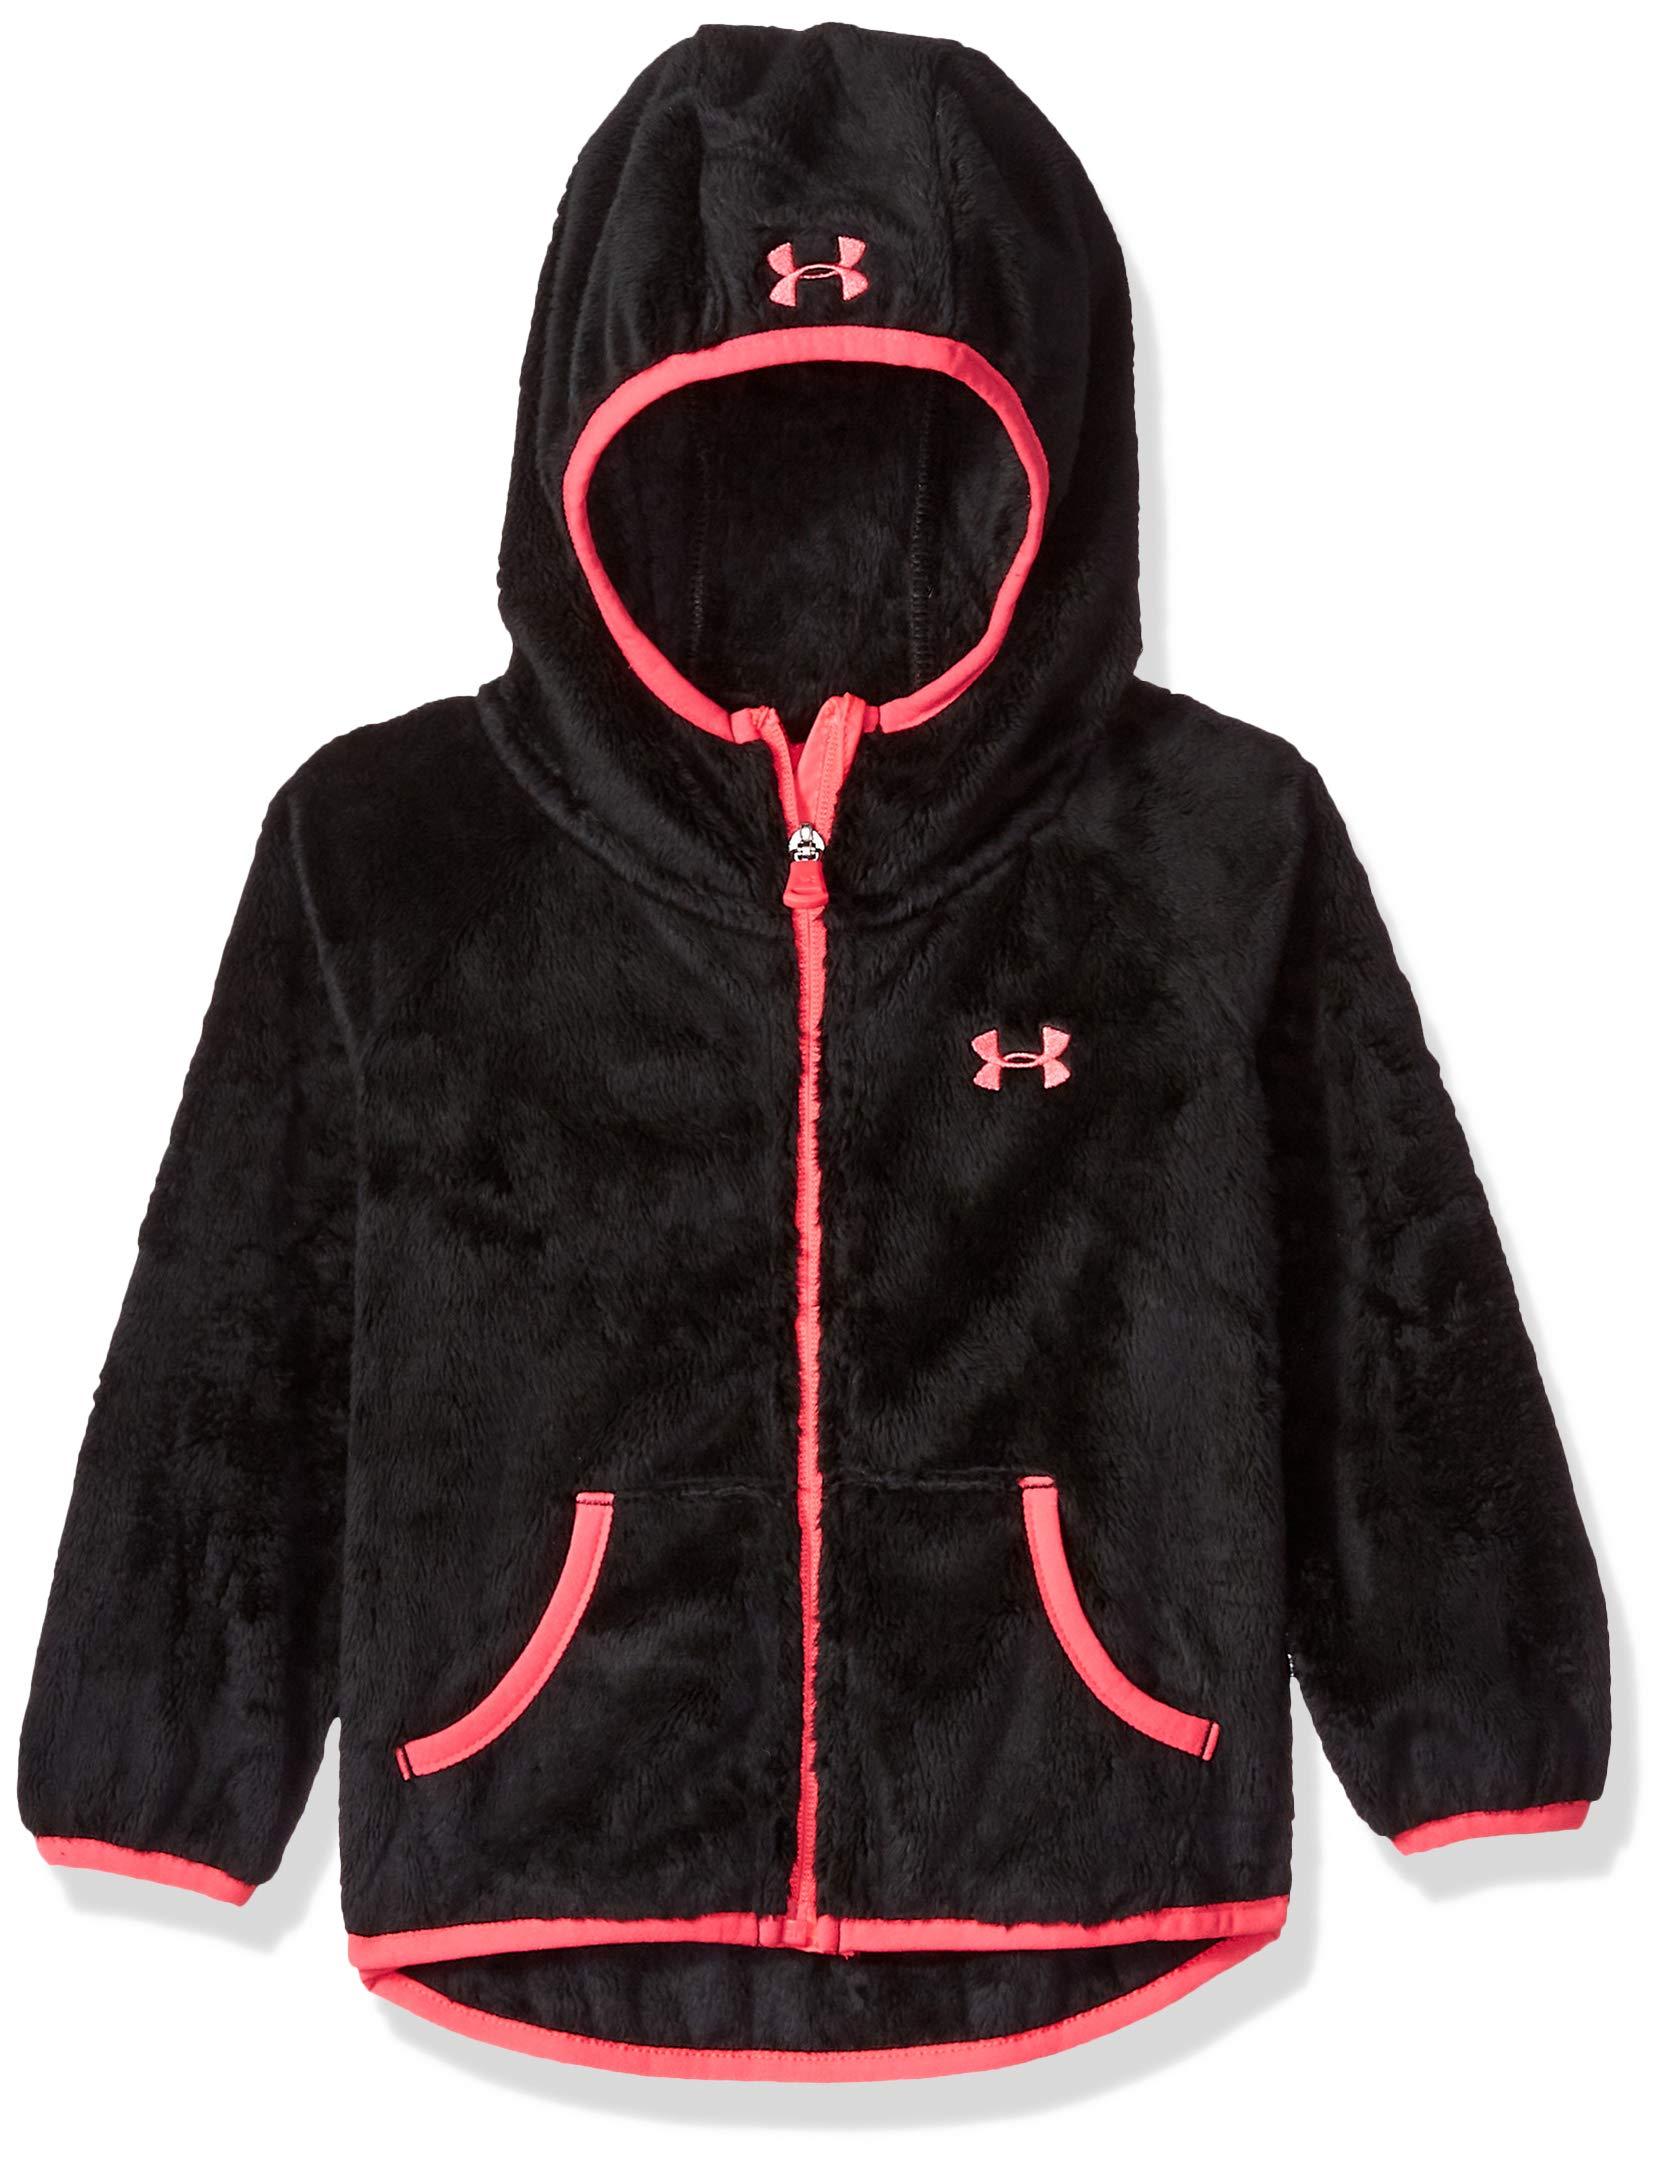 Under Armour Girls' Big ColdGear Cozy Hooded Jacket with Pocket, Black, Large (12/14)